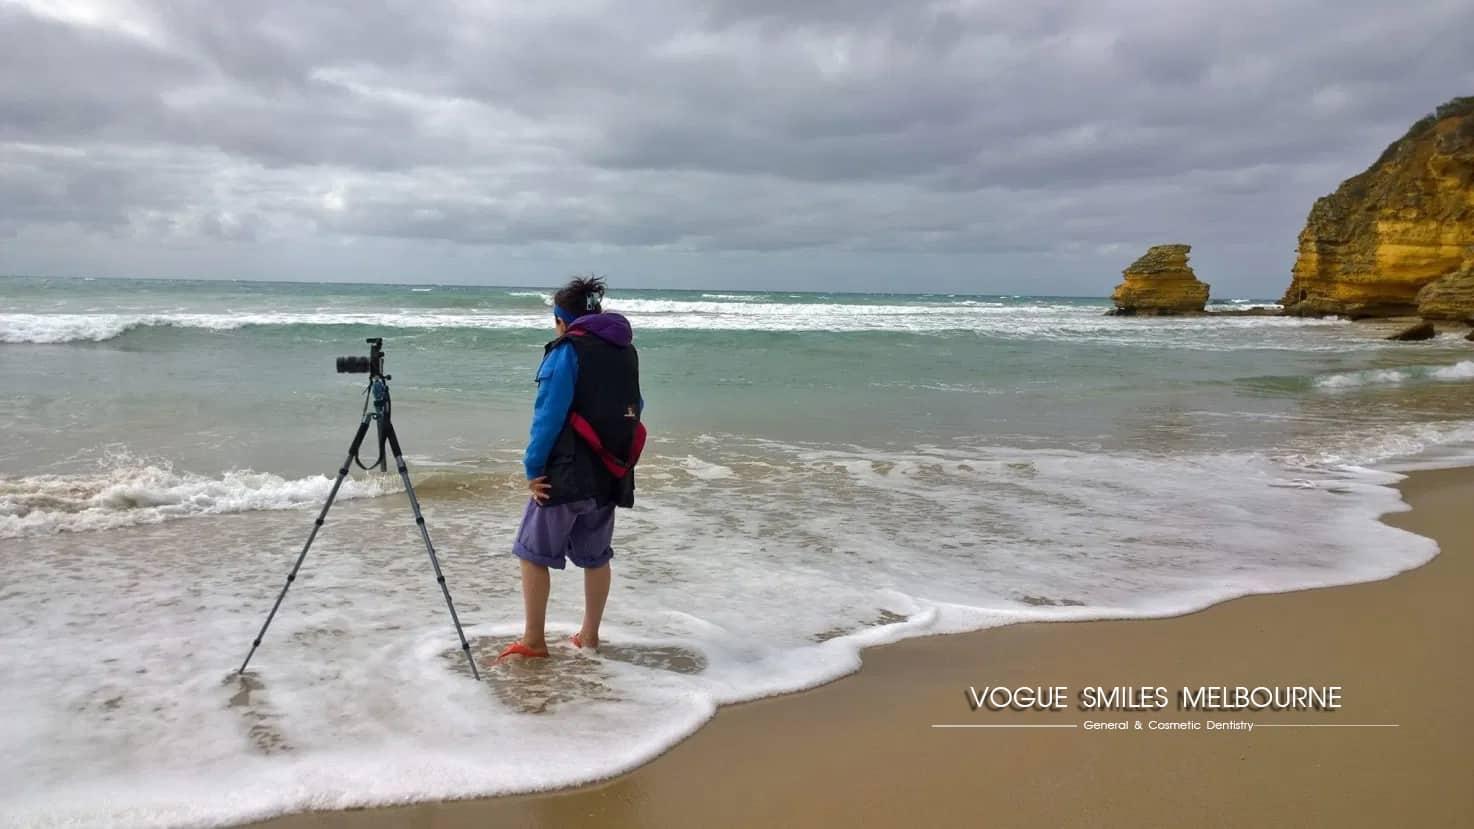 Dr Zenaidy Castro-Dentist-Photographer-Heart and Soul Whisperer Art Gallery -Vogue Smiles Melbourne